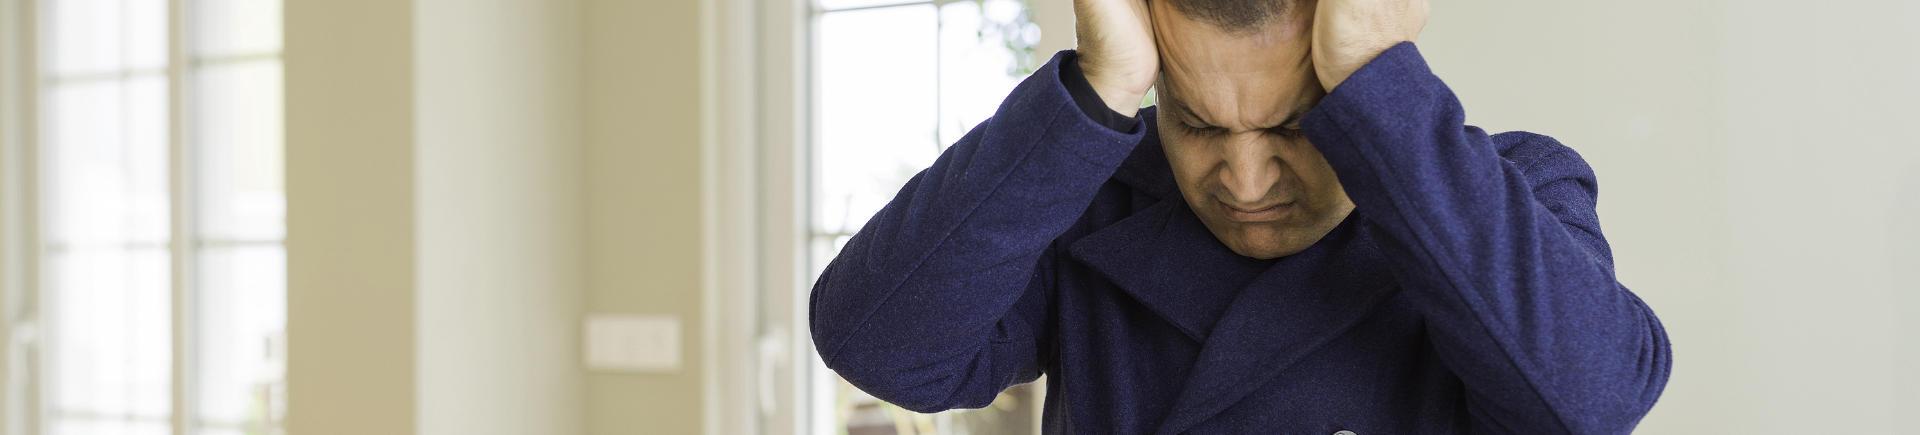 mature man suffering from severe headache